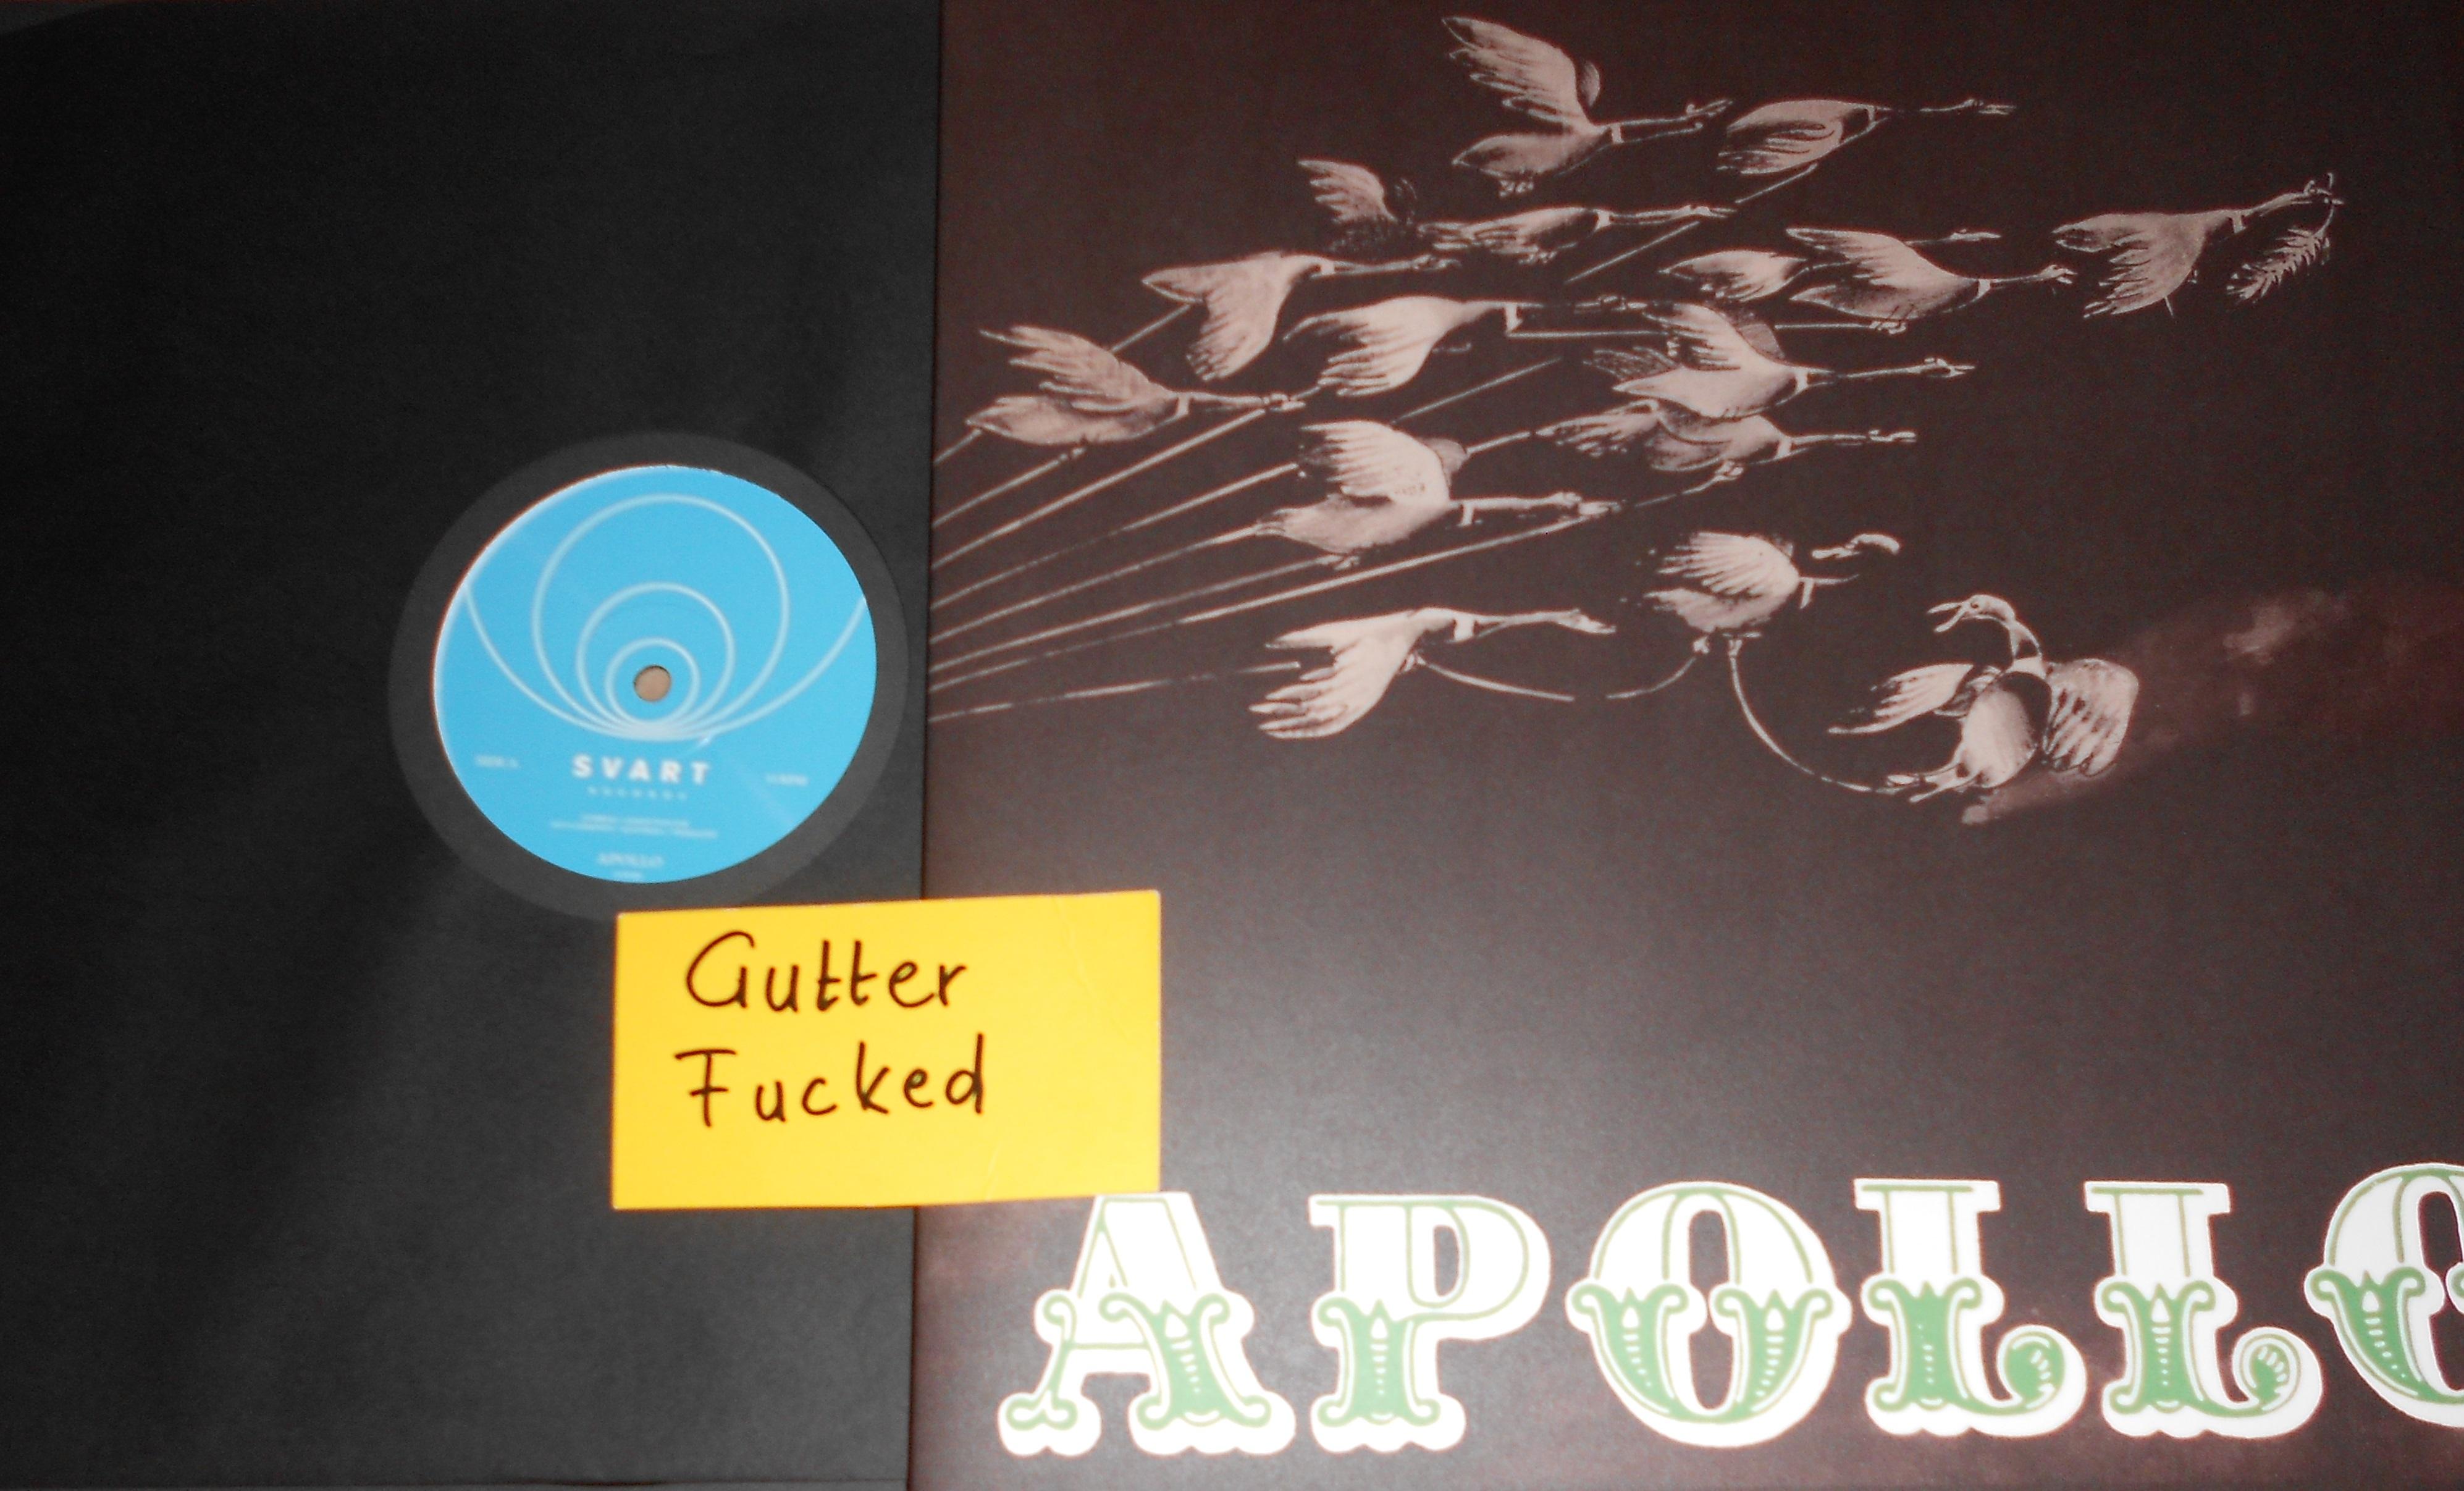 Apollo-Apollo-FI-Remastered-LP-2014-gF